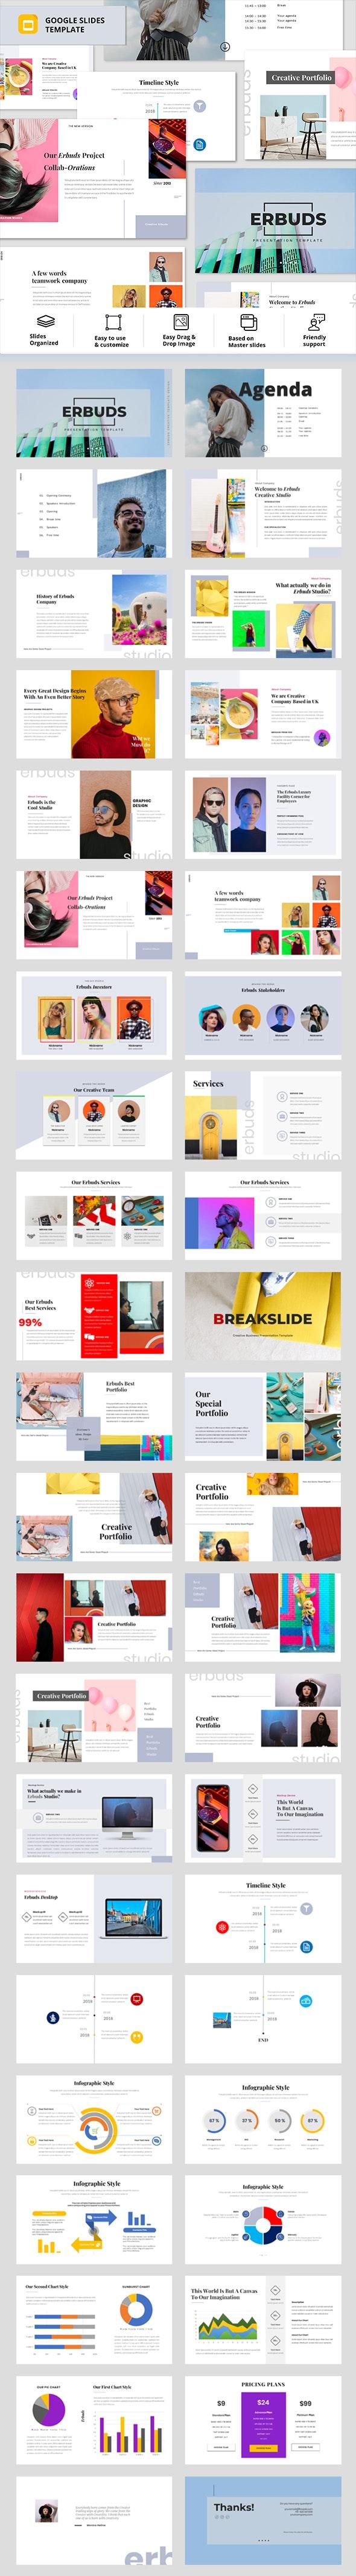 Erbuds - Creative Business Google Slides Template - Google Slides Presentation Templates